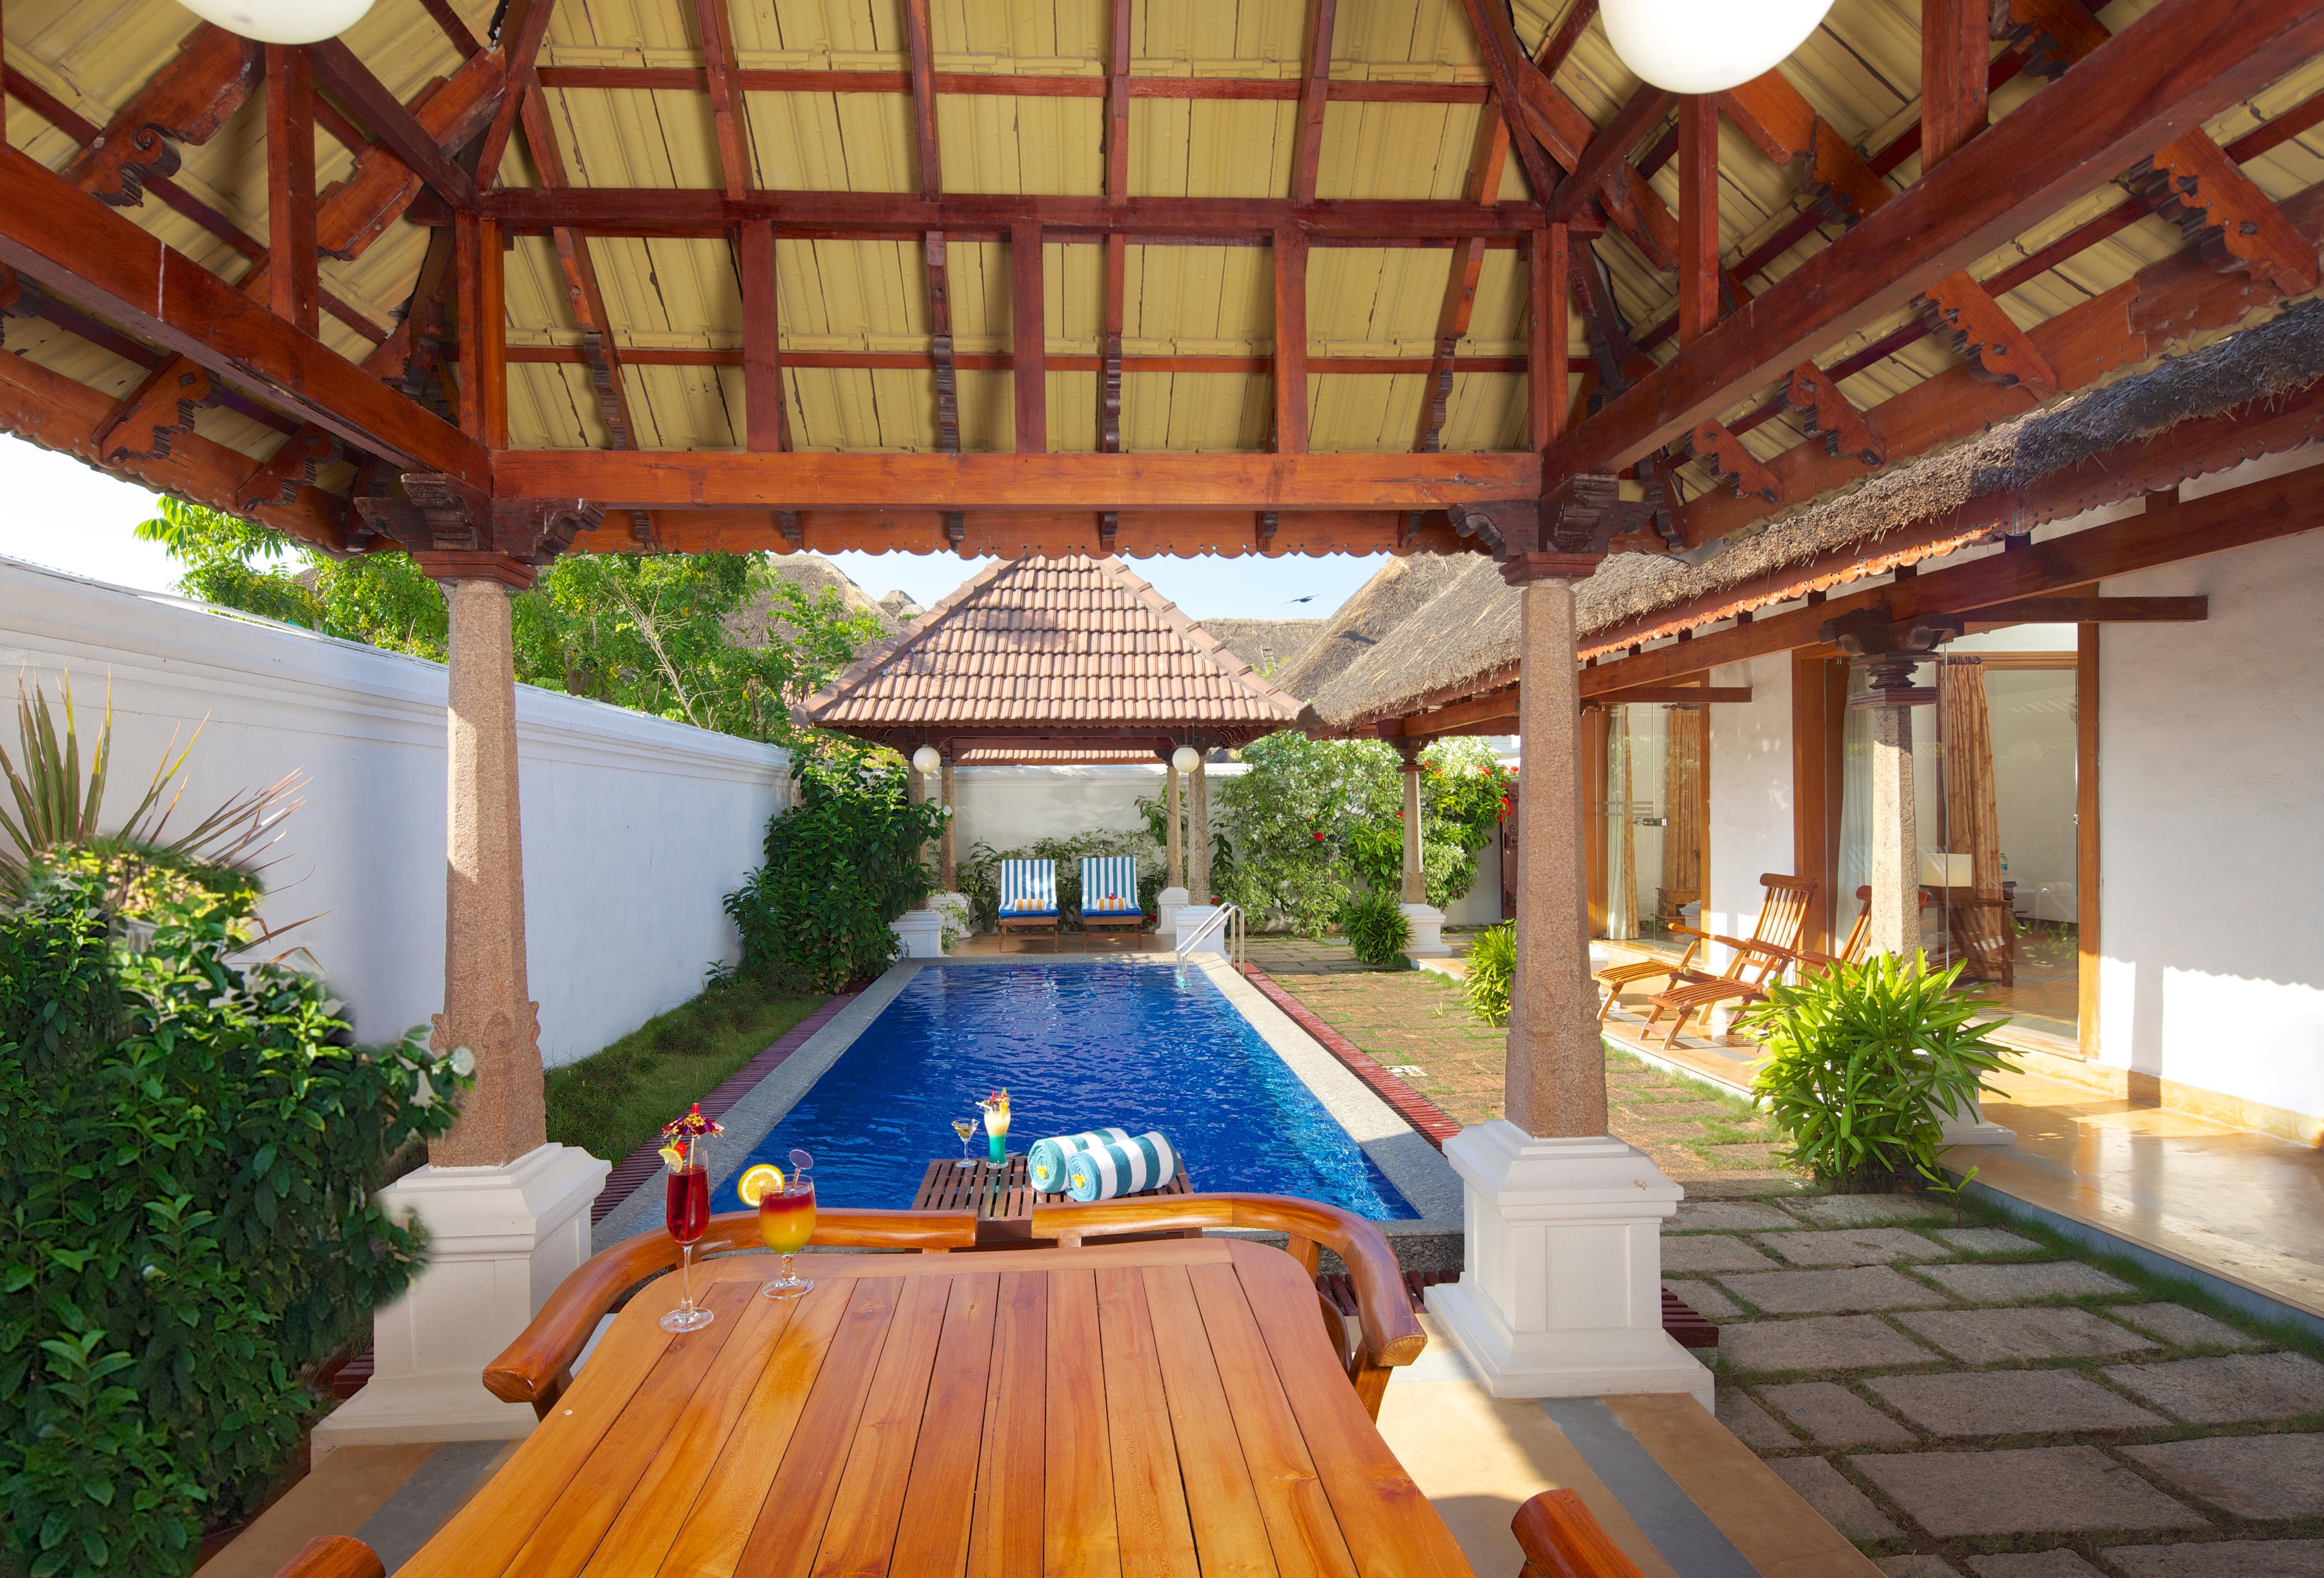 Inde location vacances villa luxe pondich ry - Residence de luxe montagne locati ...